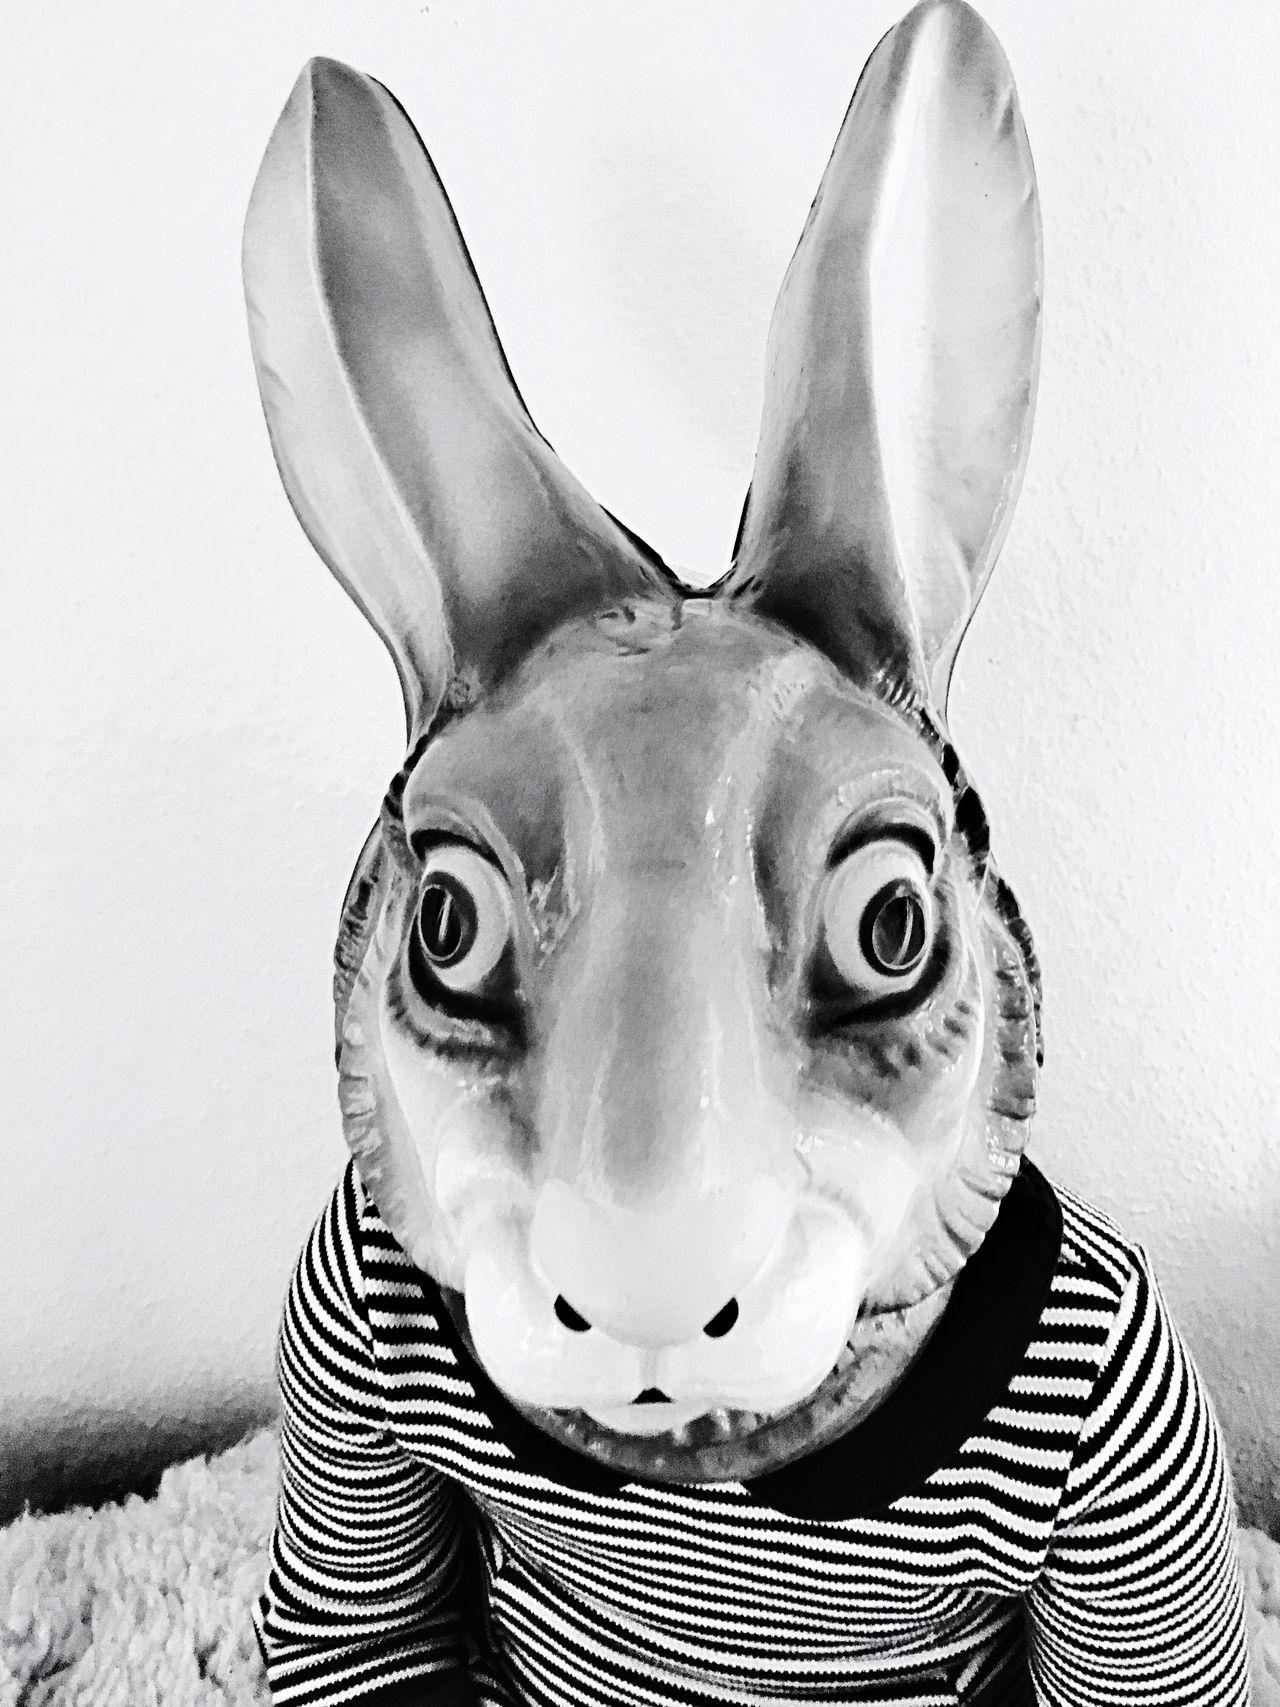 Happyeaster Bunny